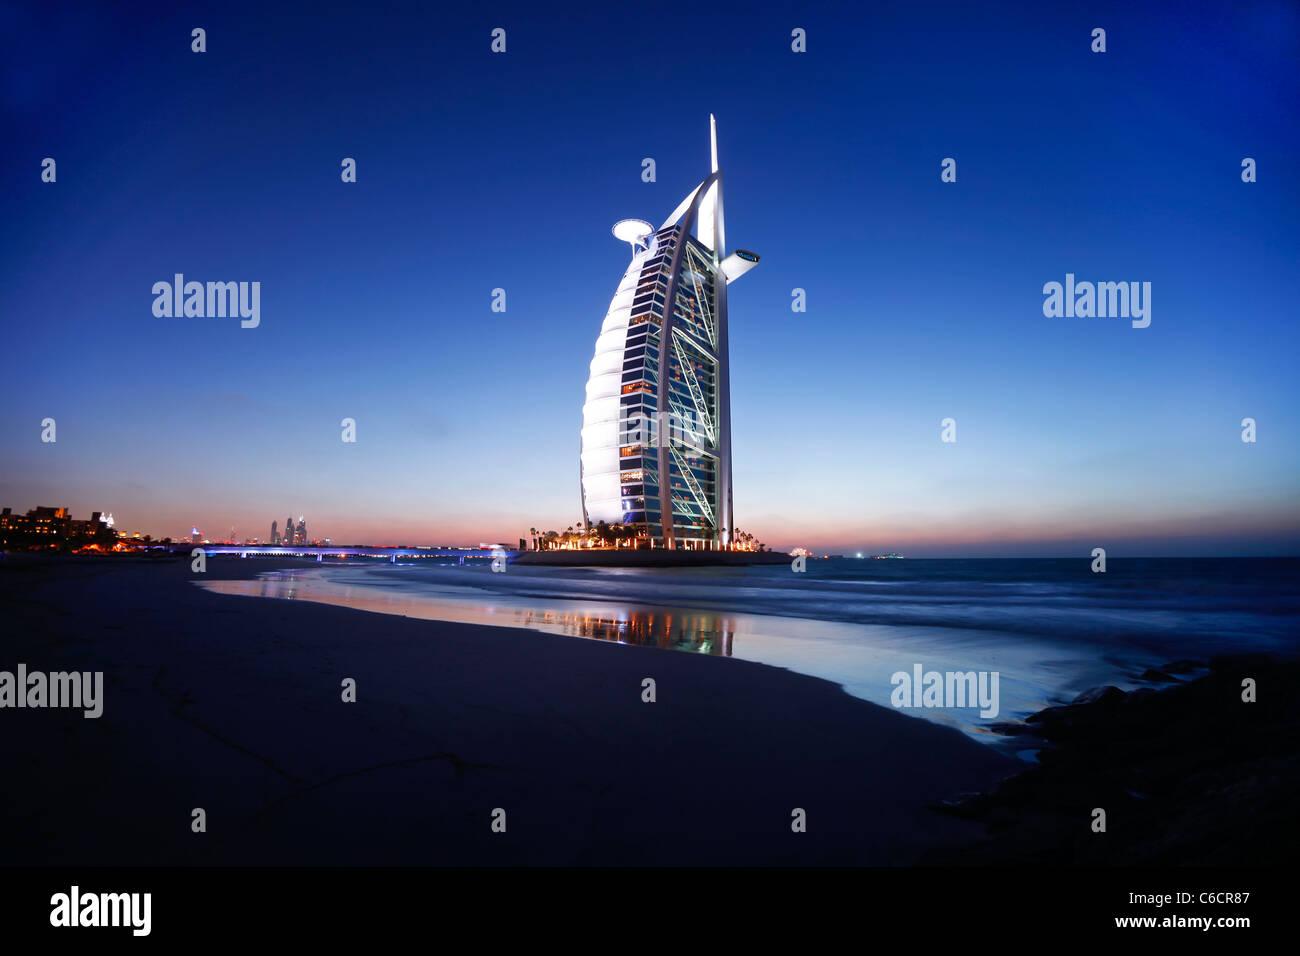 Hotel Burj Al Arab, Dubai, Emiratos Árabes Unidos. Imagen De Stock